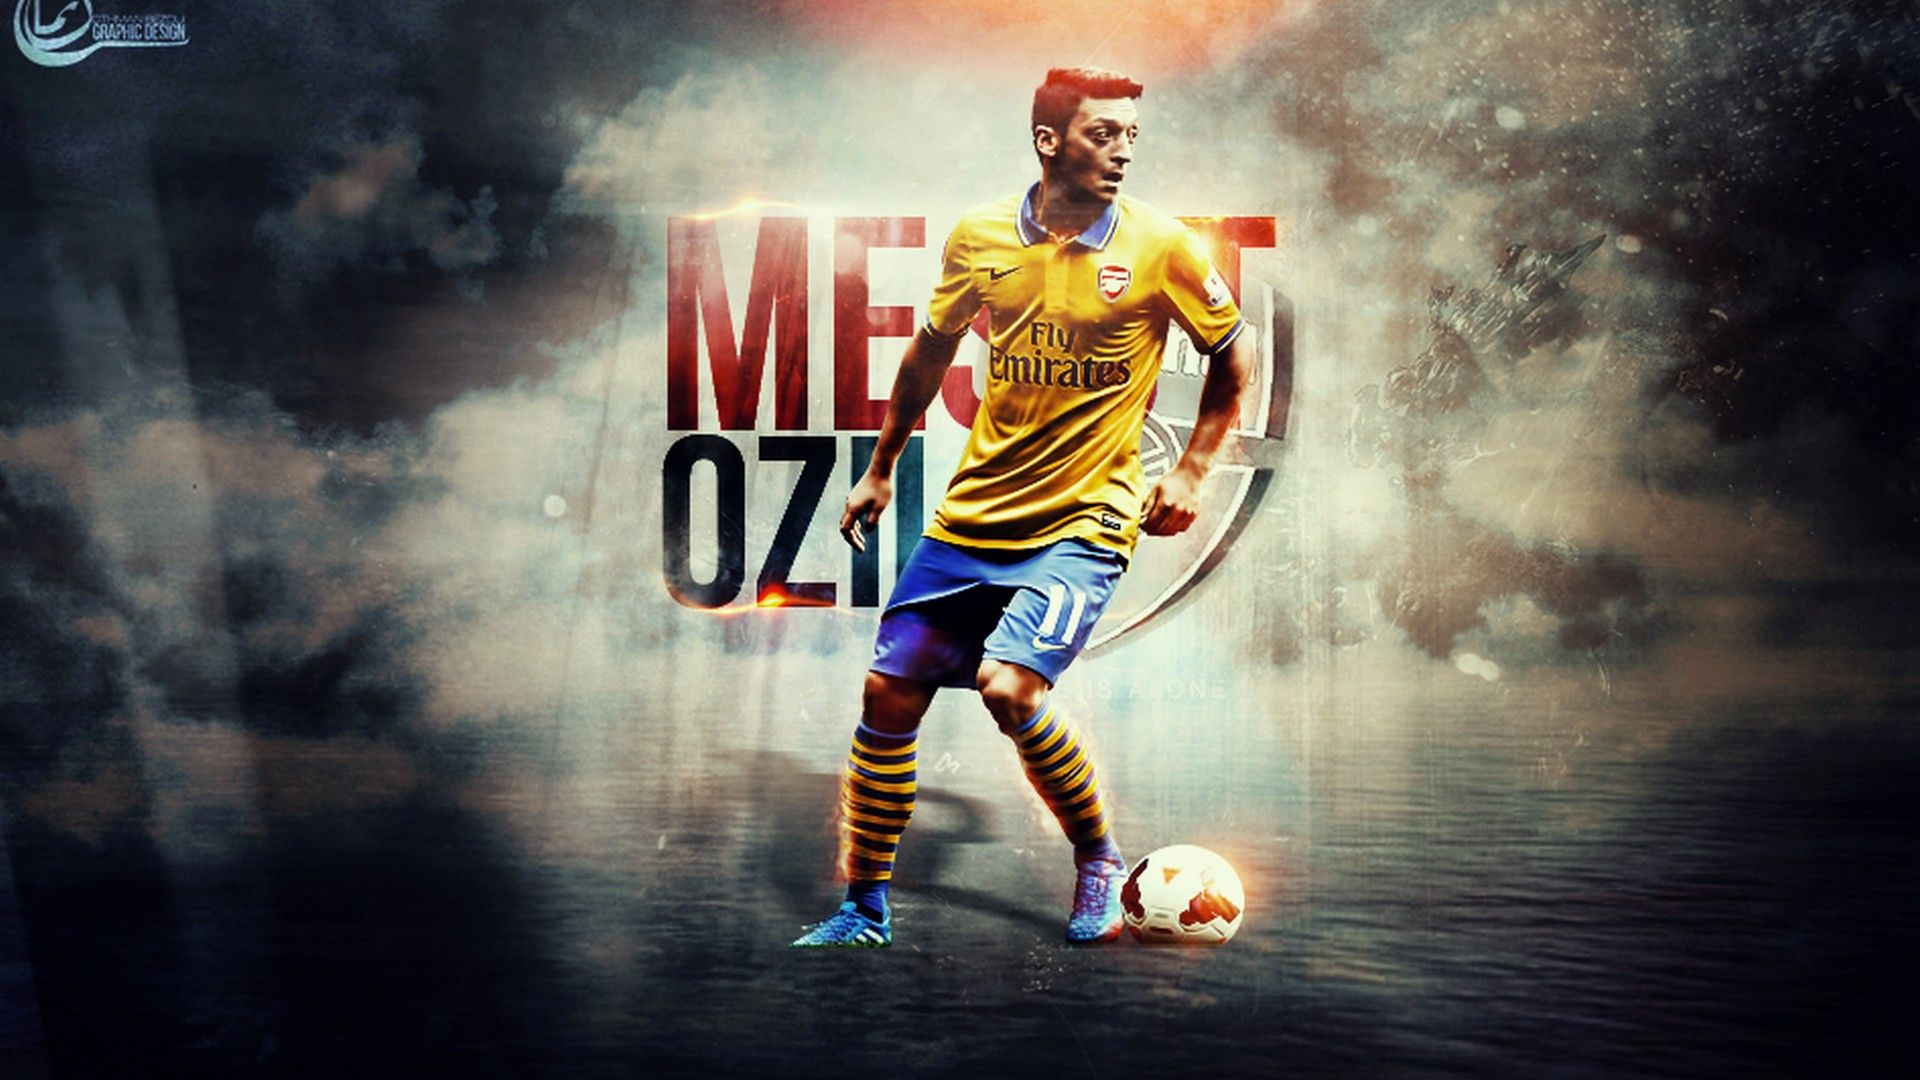 Mesut Ozil Arsenal Wallpaper Arsenal wallpapers, Mesut